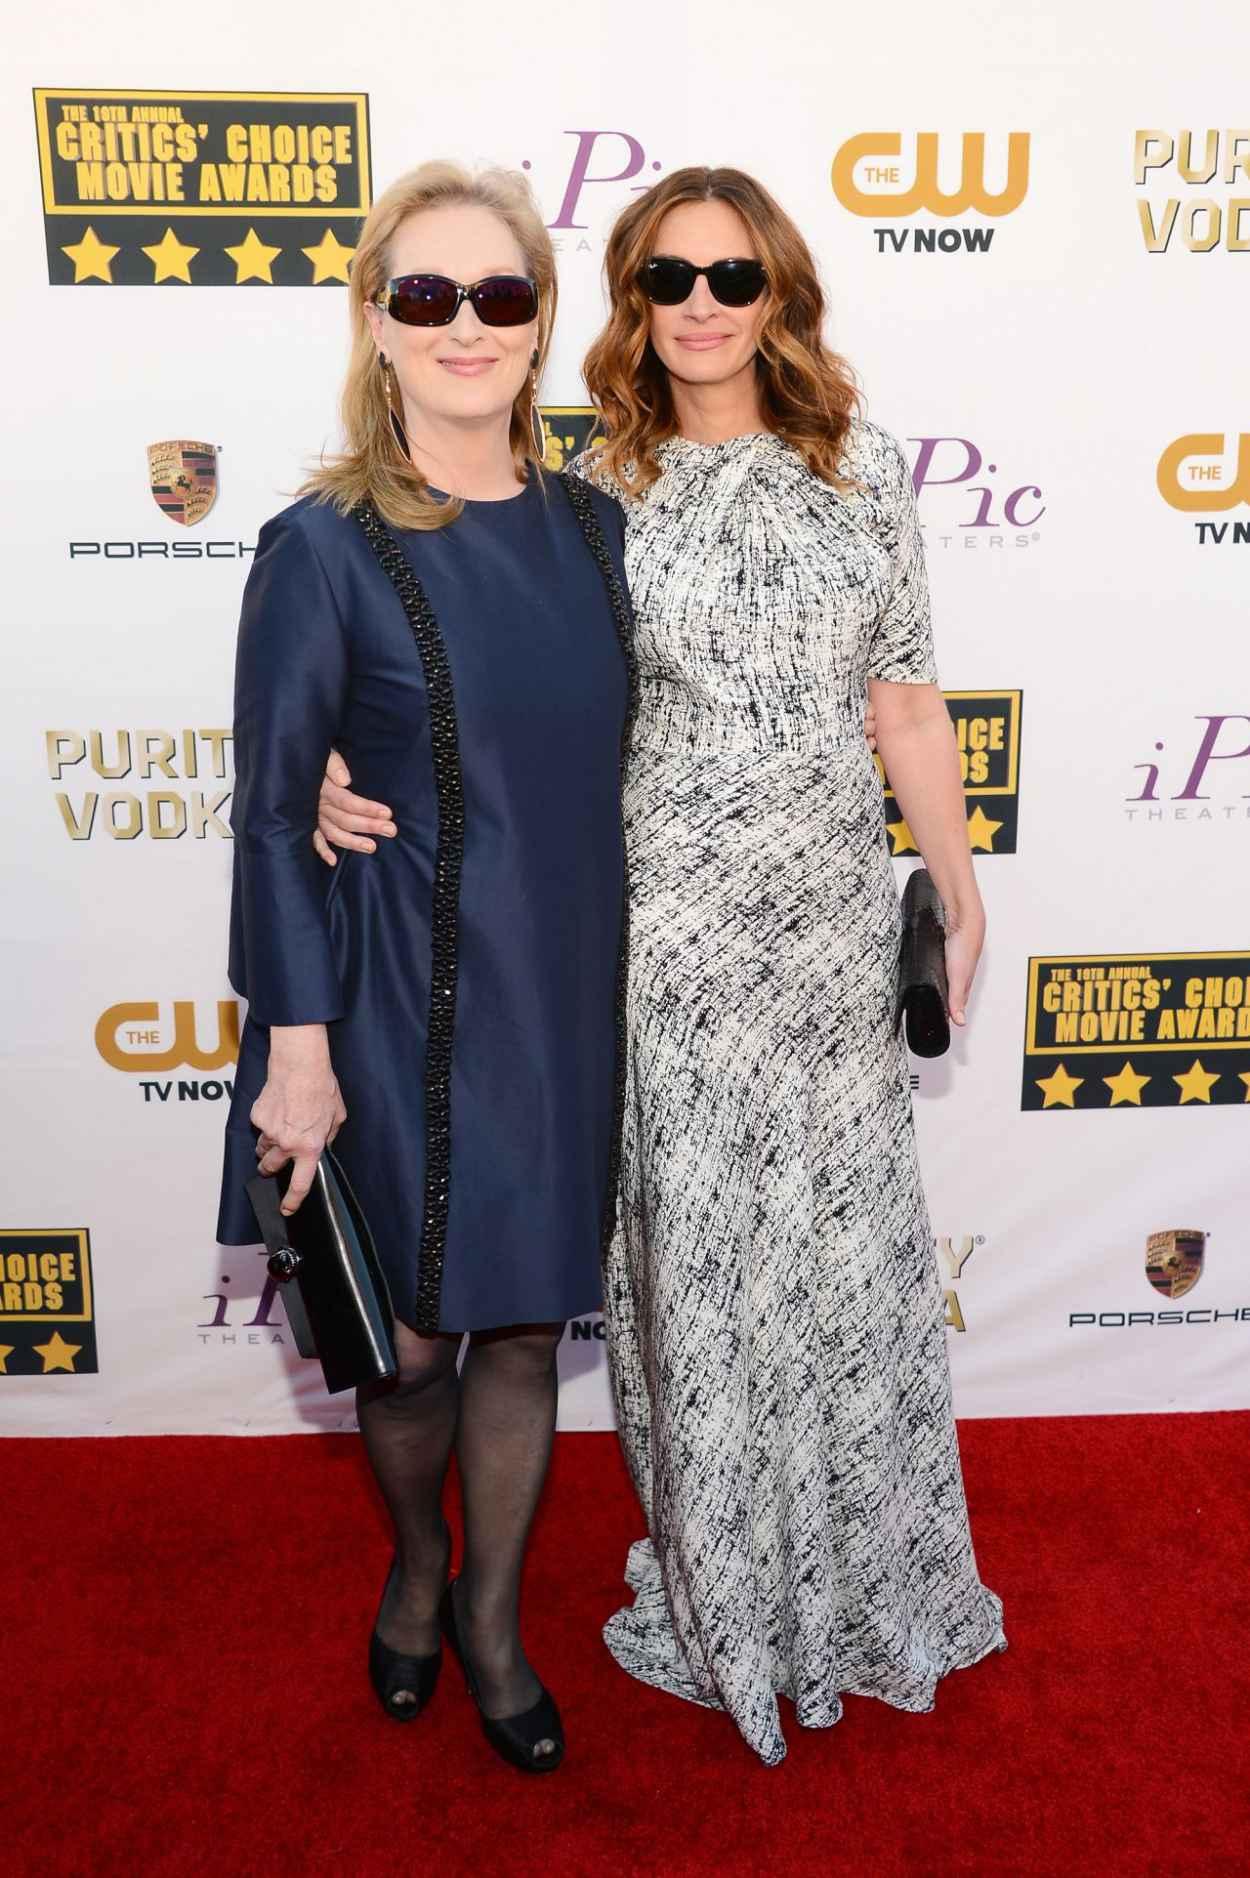 Meryl Streep & Julia Roberts at 19th Annual Critics Choice Movie Awards in Santa Monica, January 2015-1